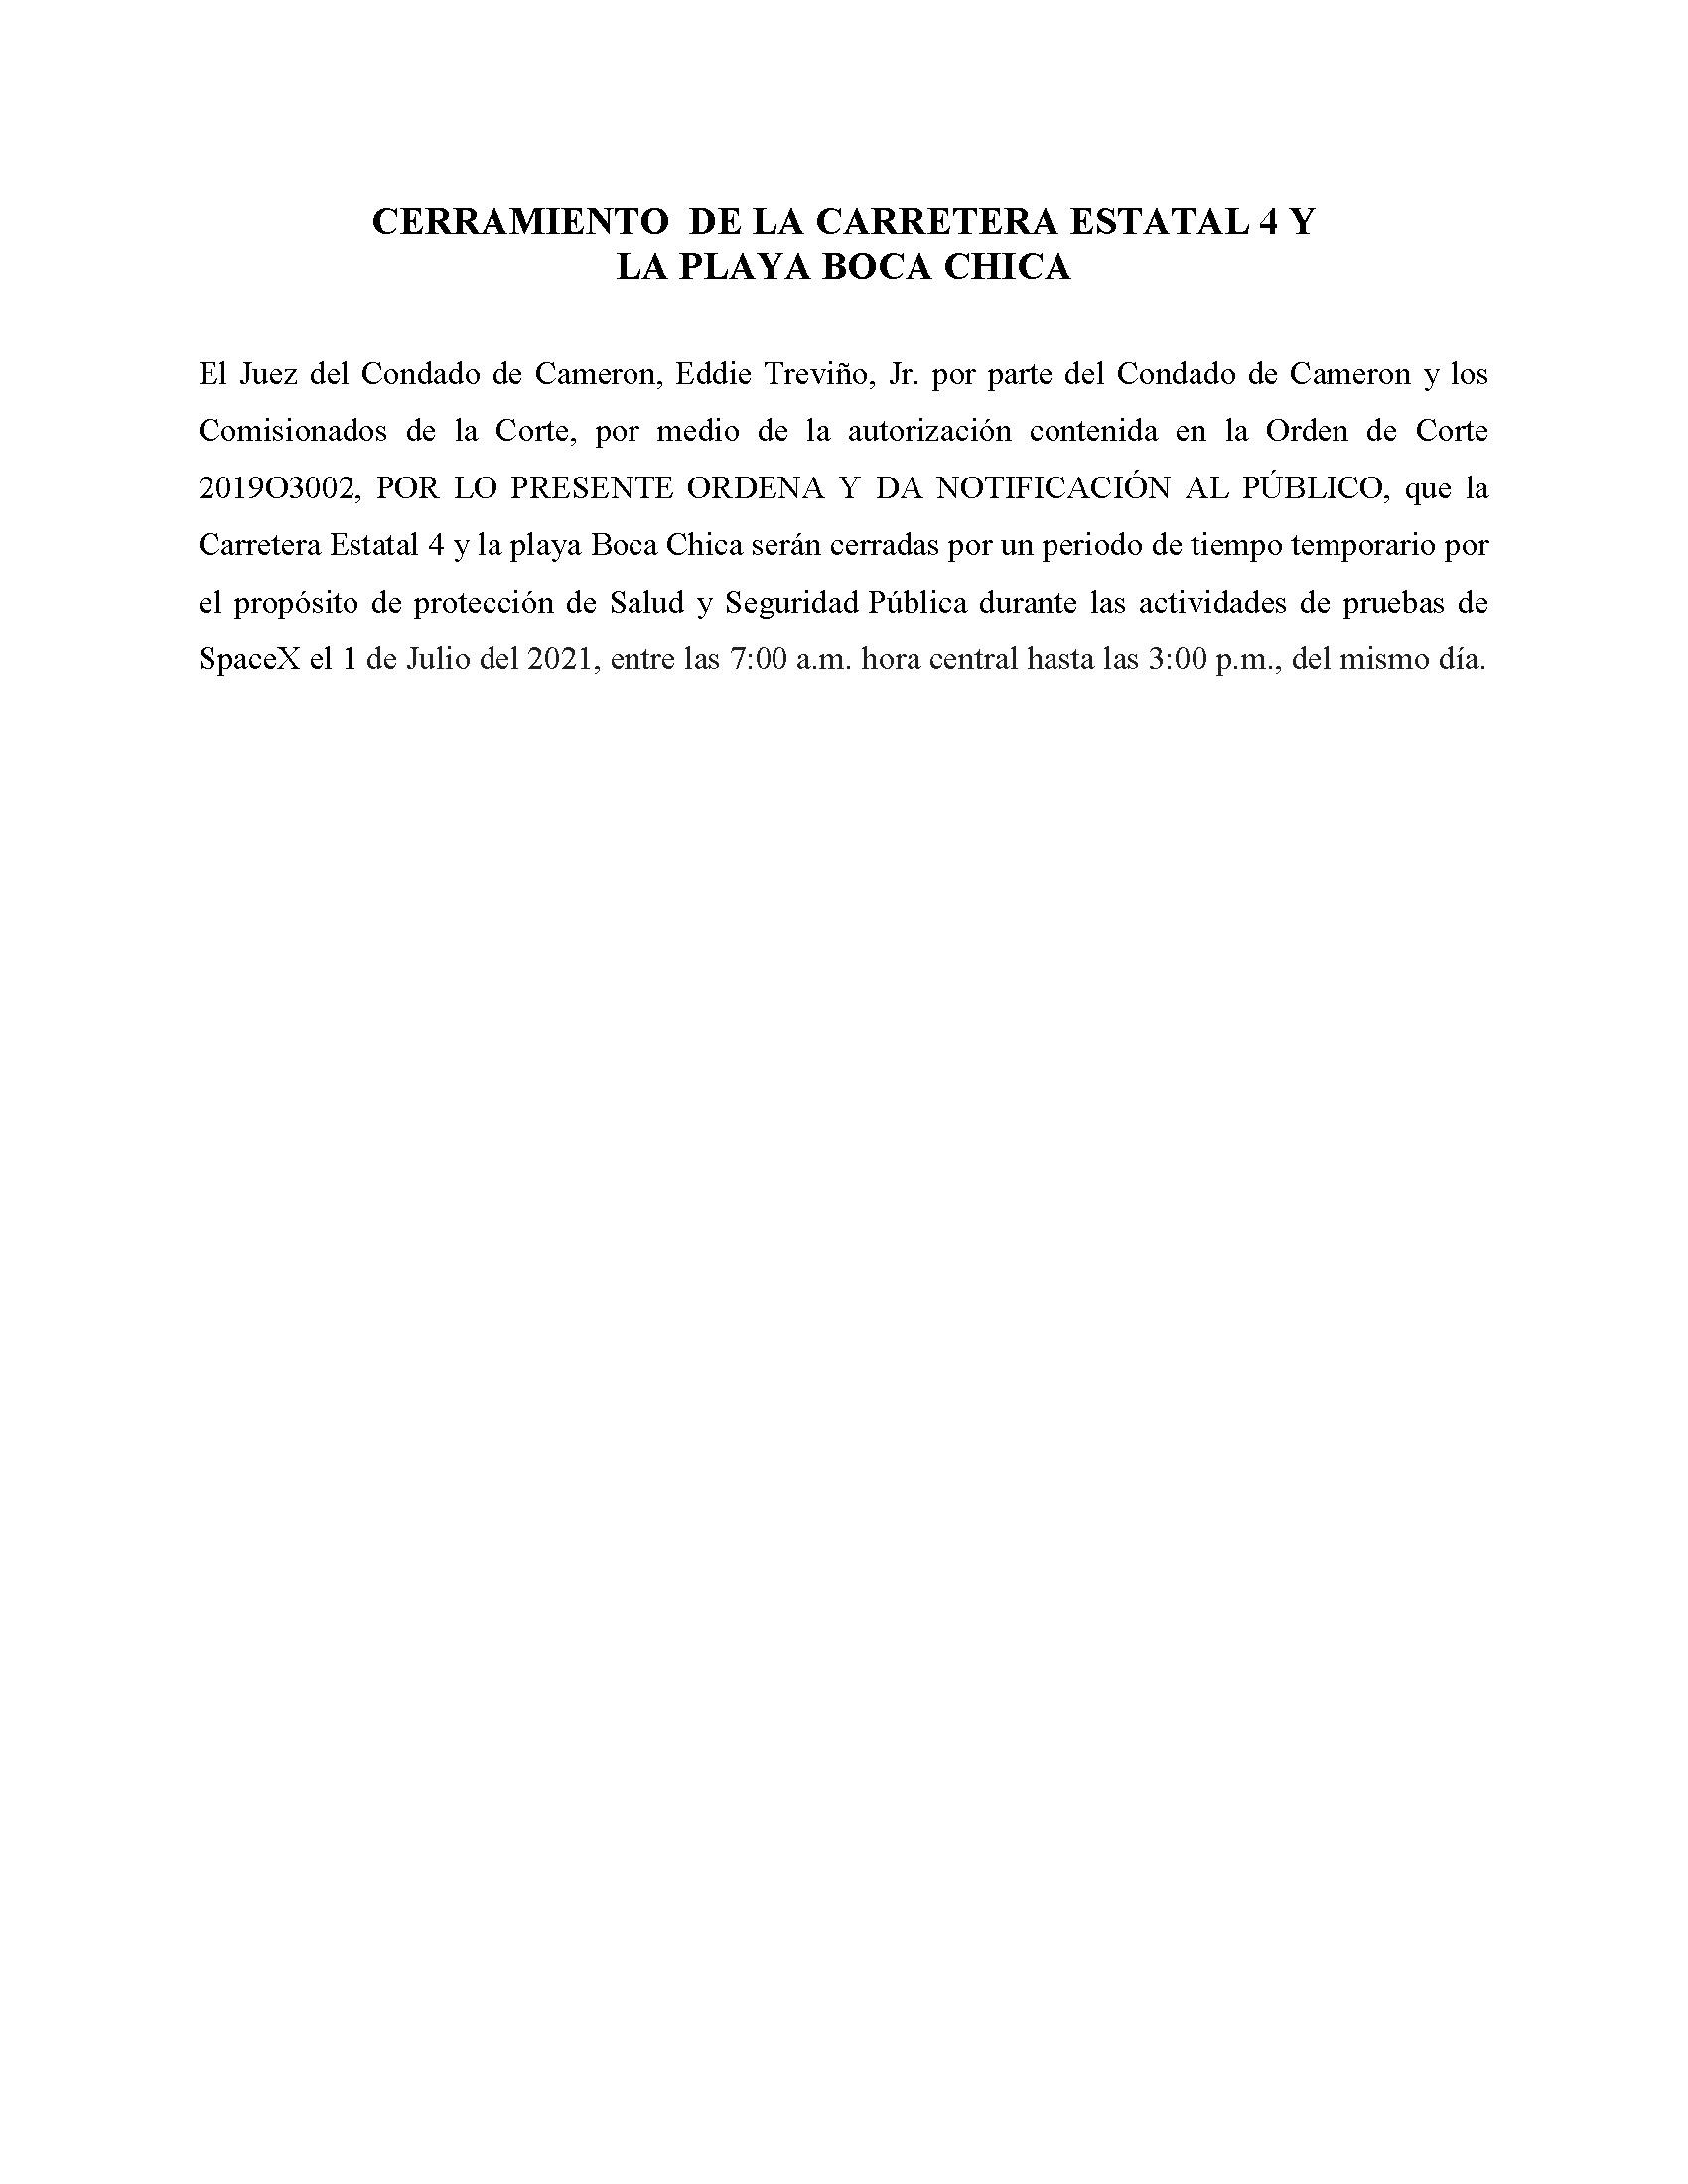 ORDER.CLOSURE OF HIGHWAY 4 Y LA PLAYA BOCA CHICA.SPANISH.07.01.2021